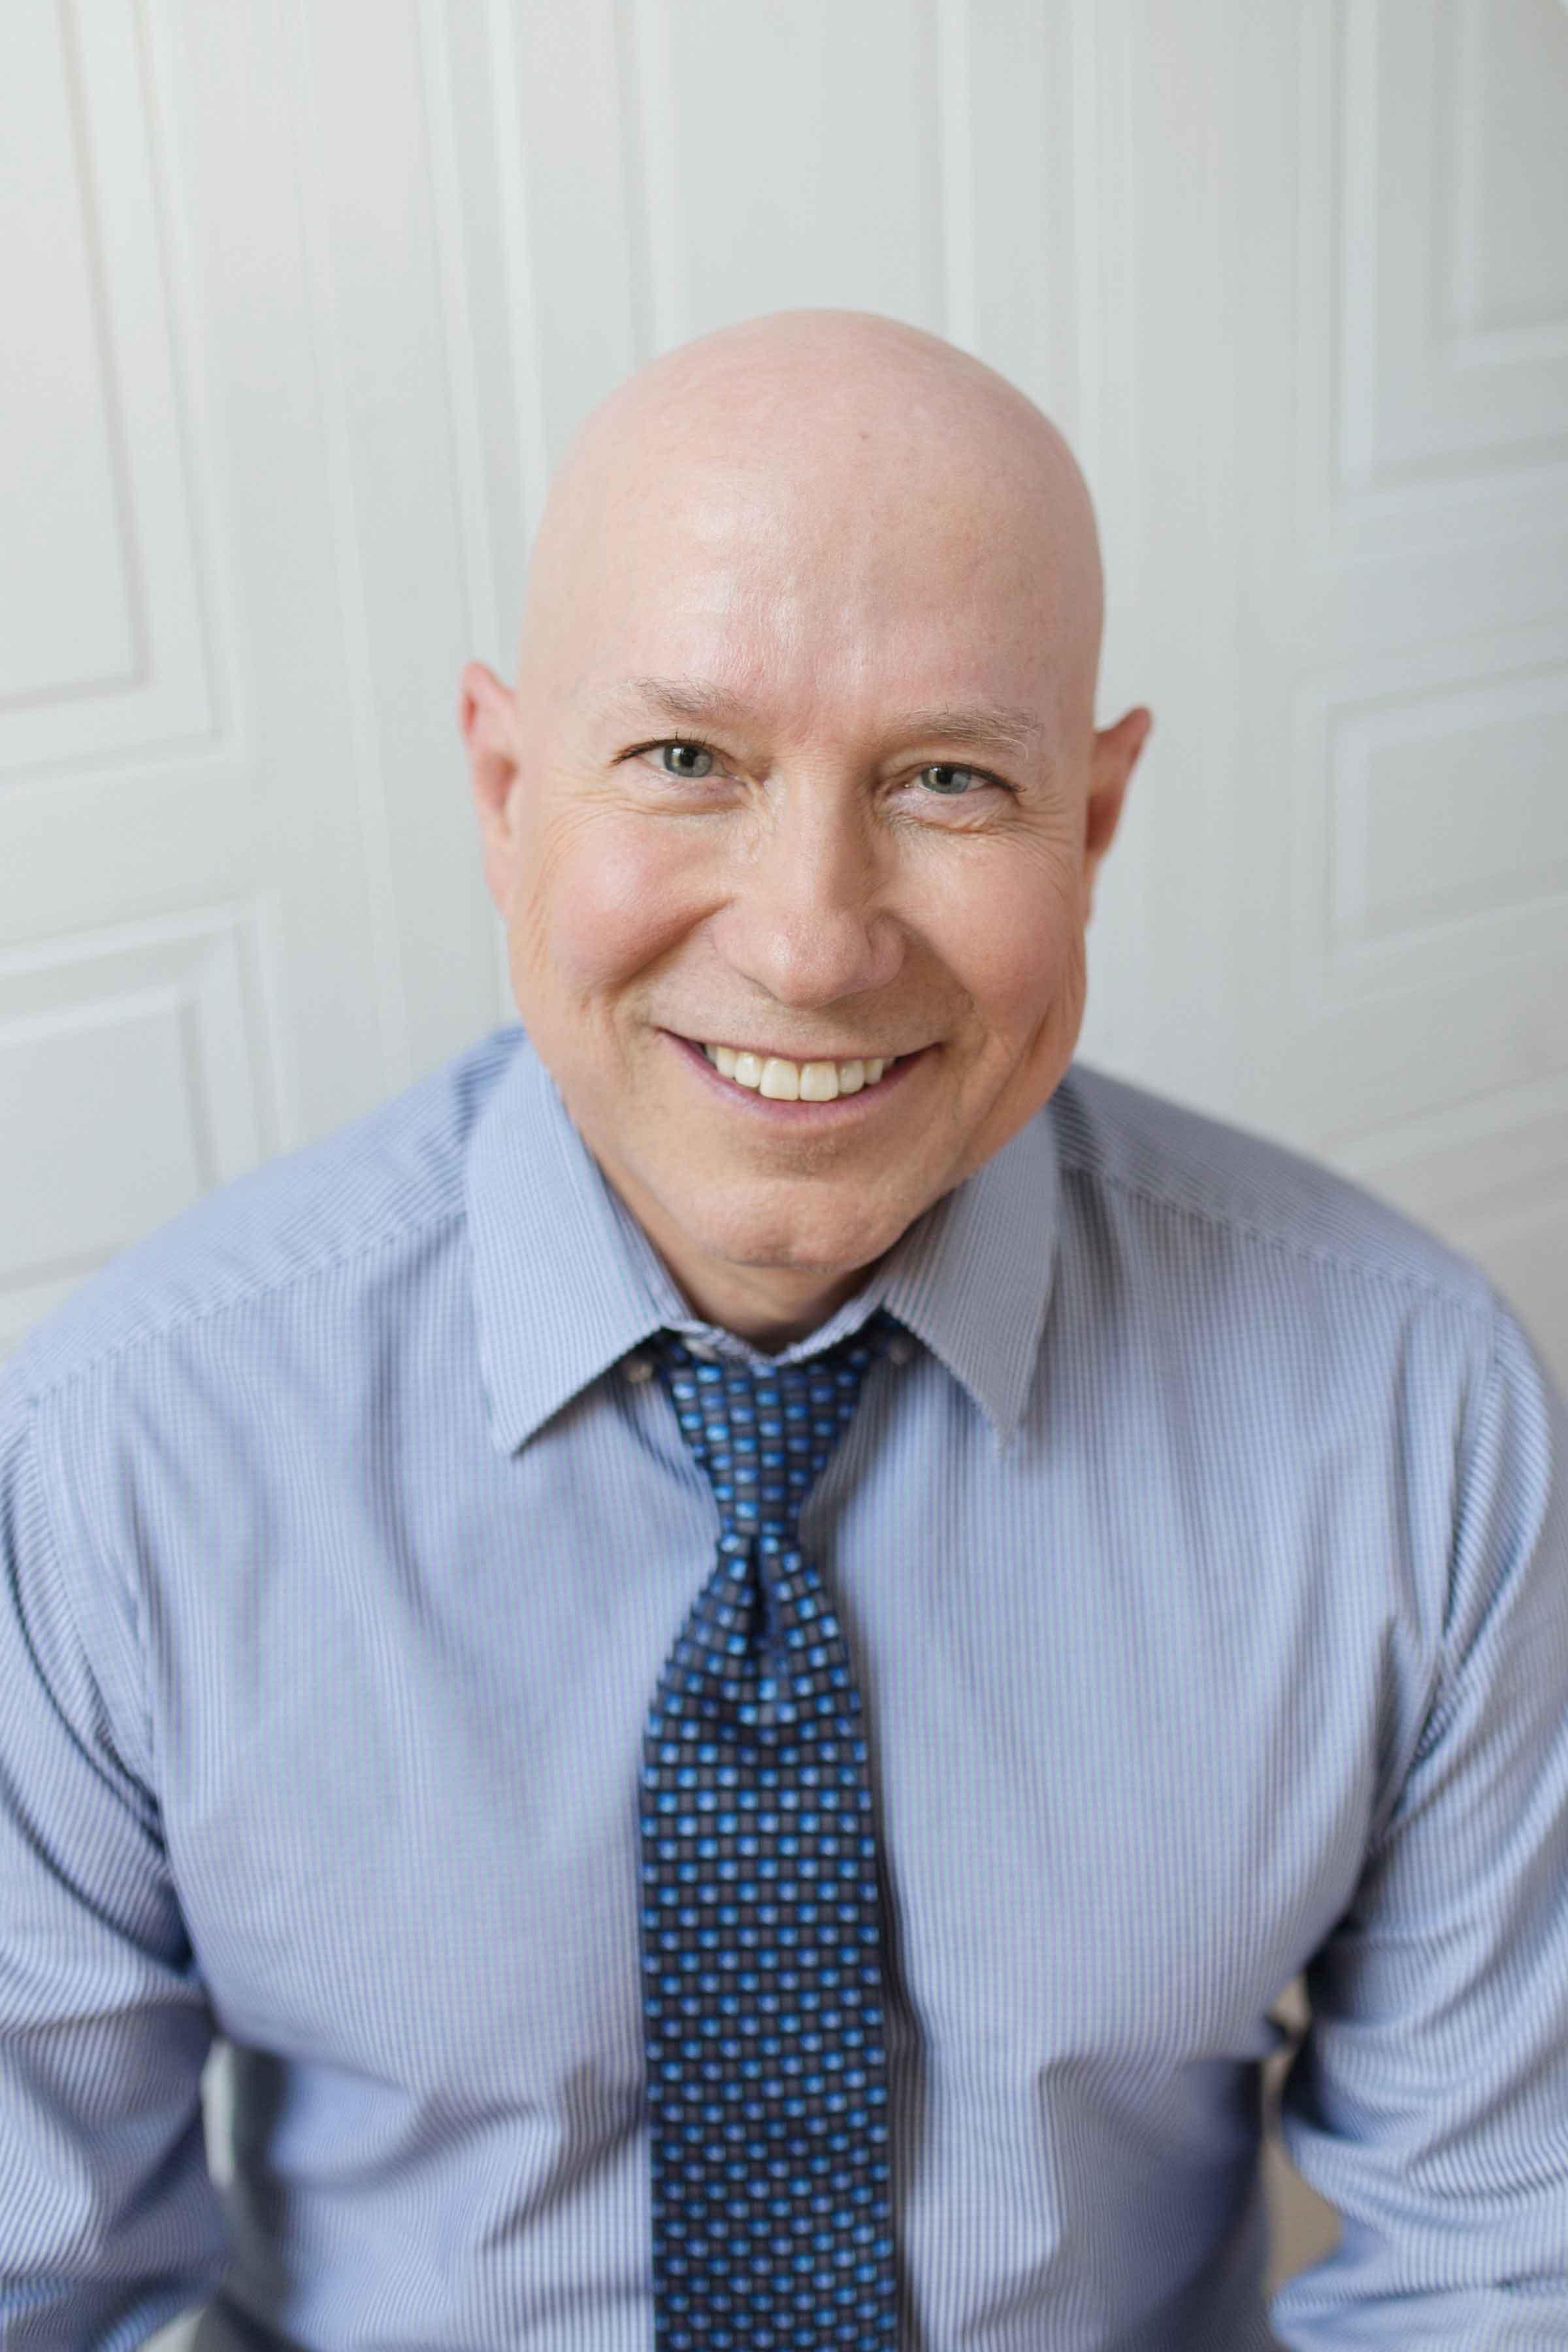 Rick Schue, MS, FNP-C